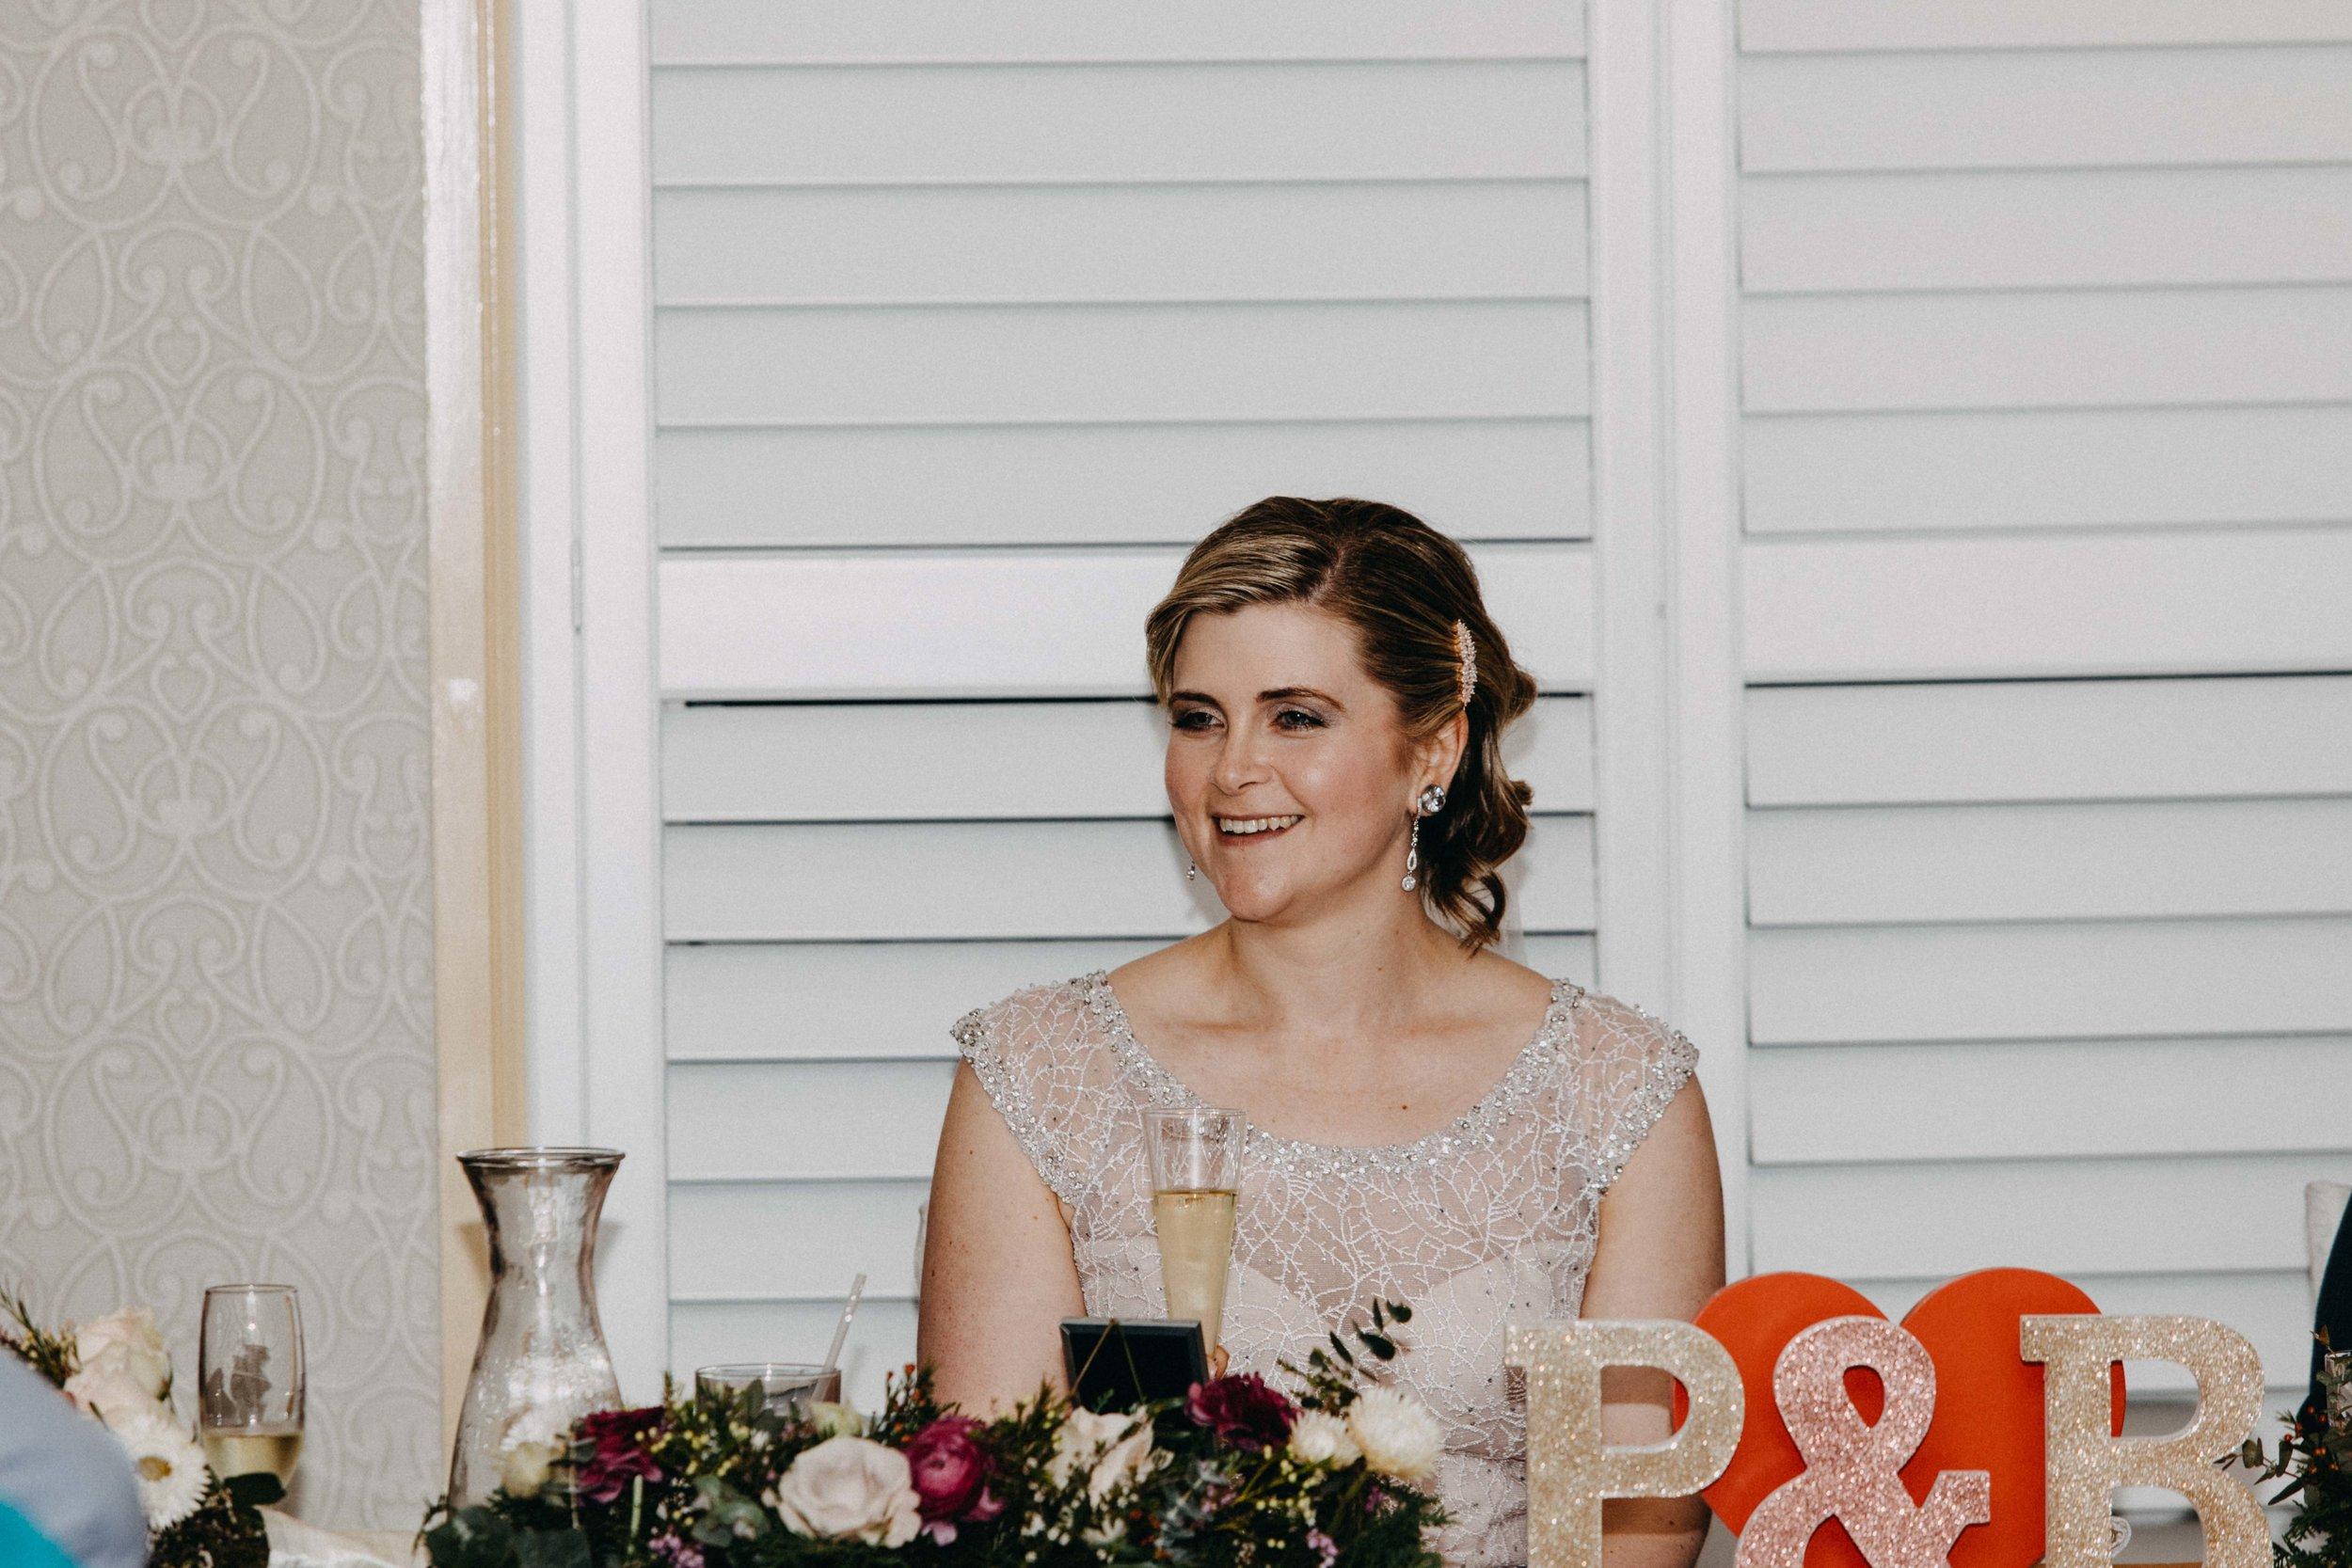 appin-house-wedding-macarthur-www.emilyobrienphotography.net-163.jpg